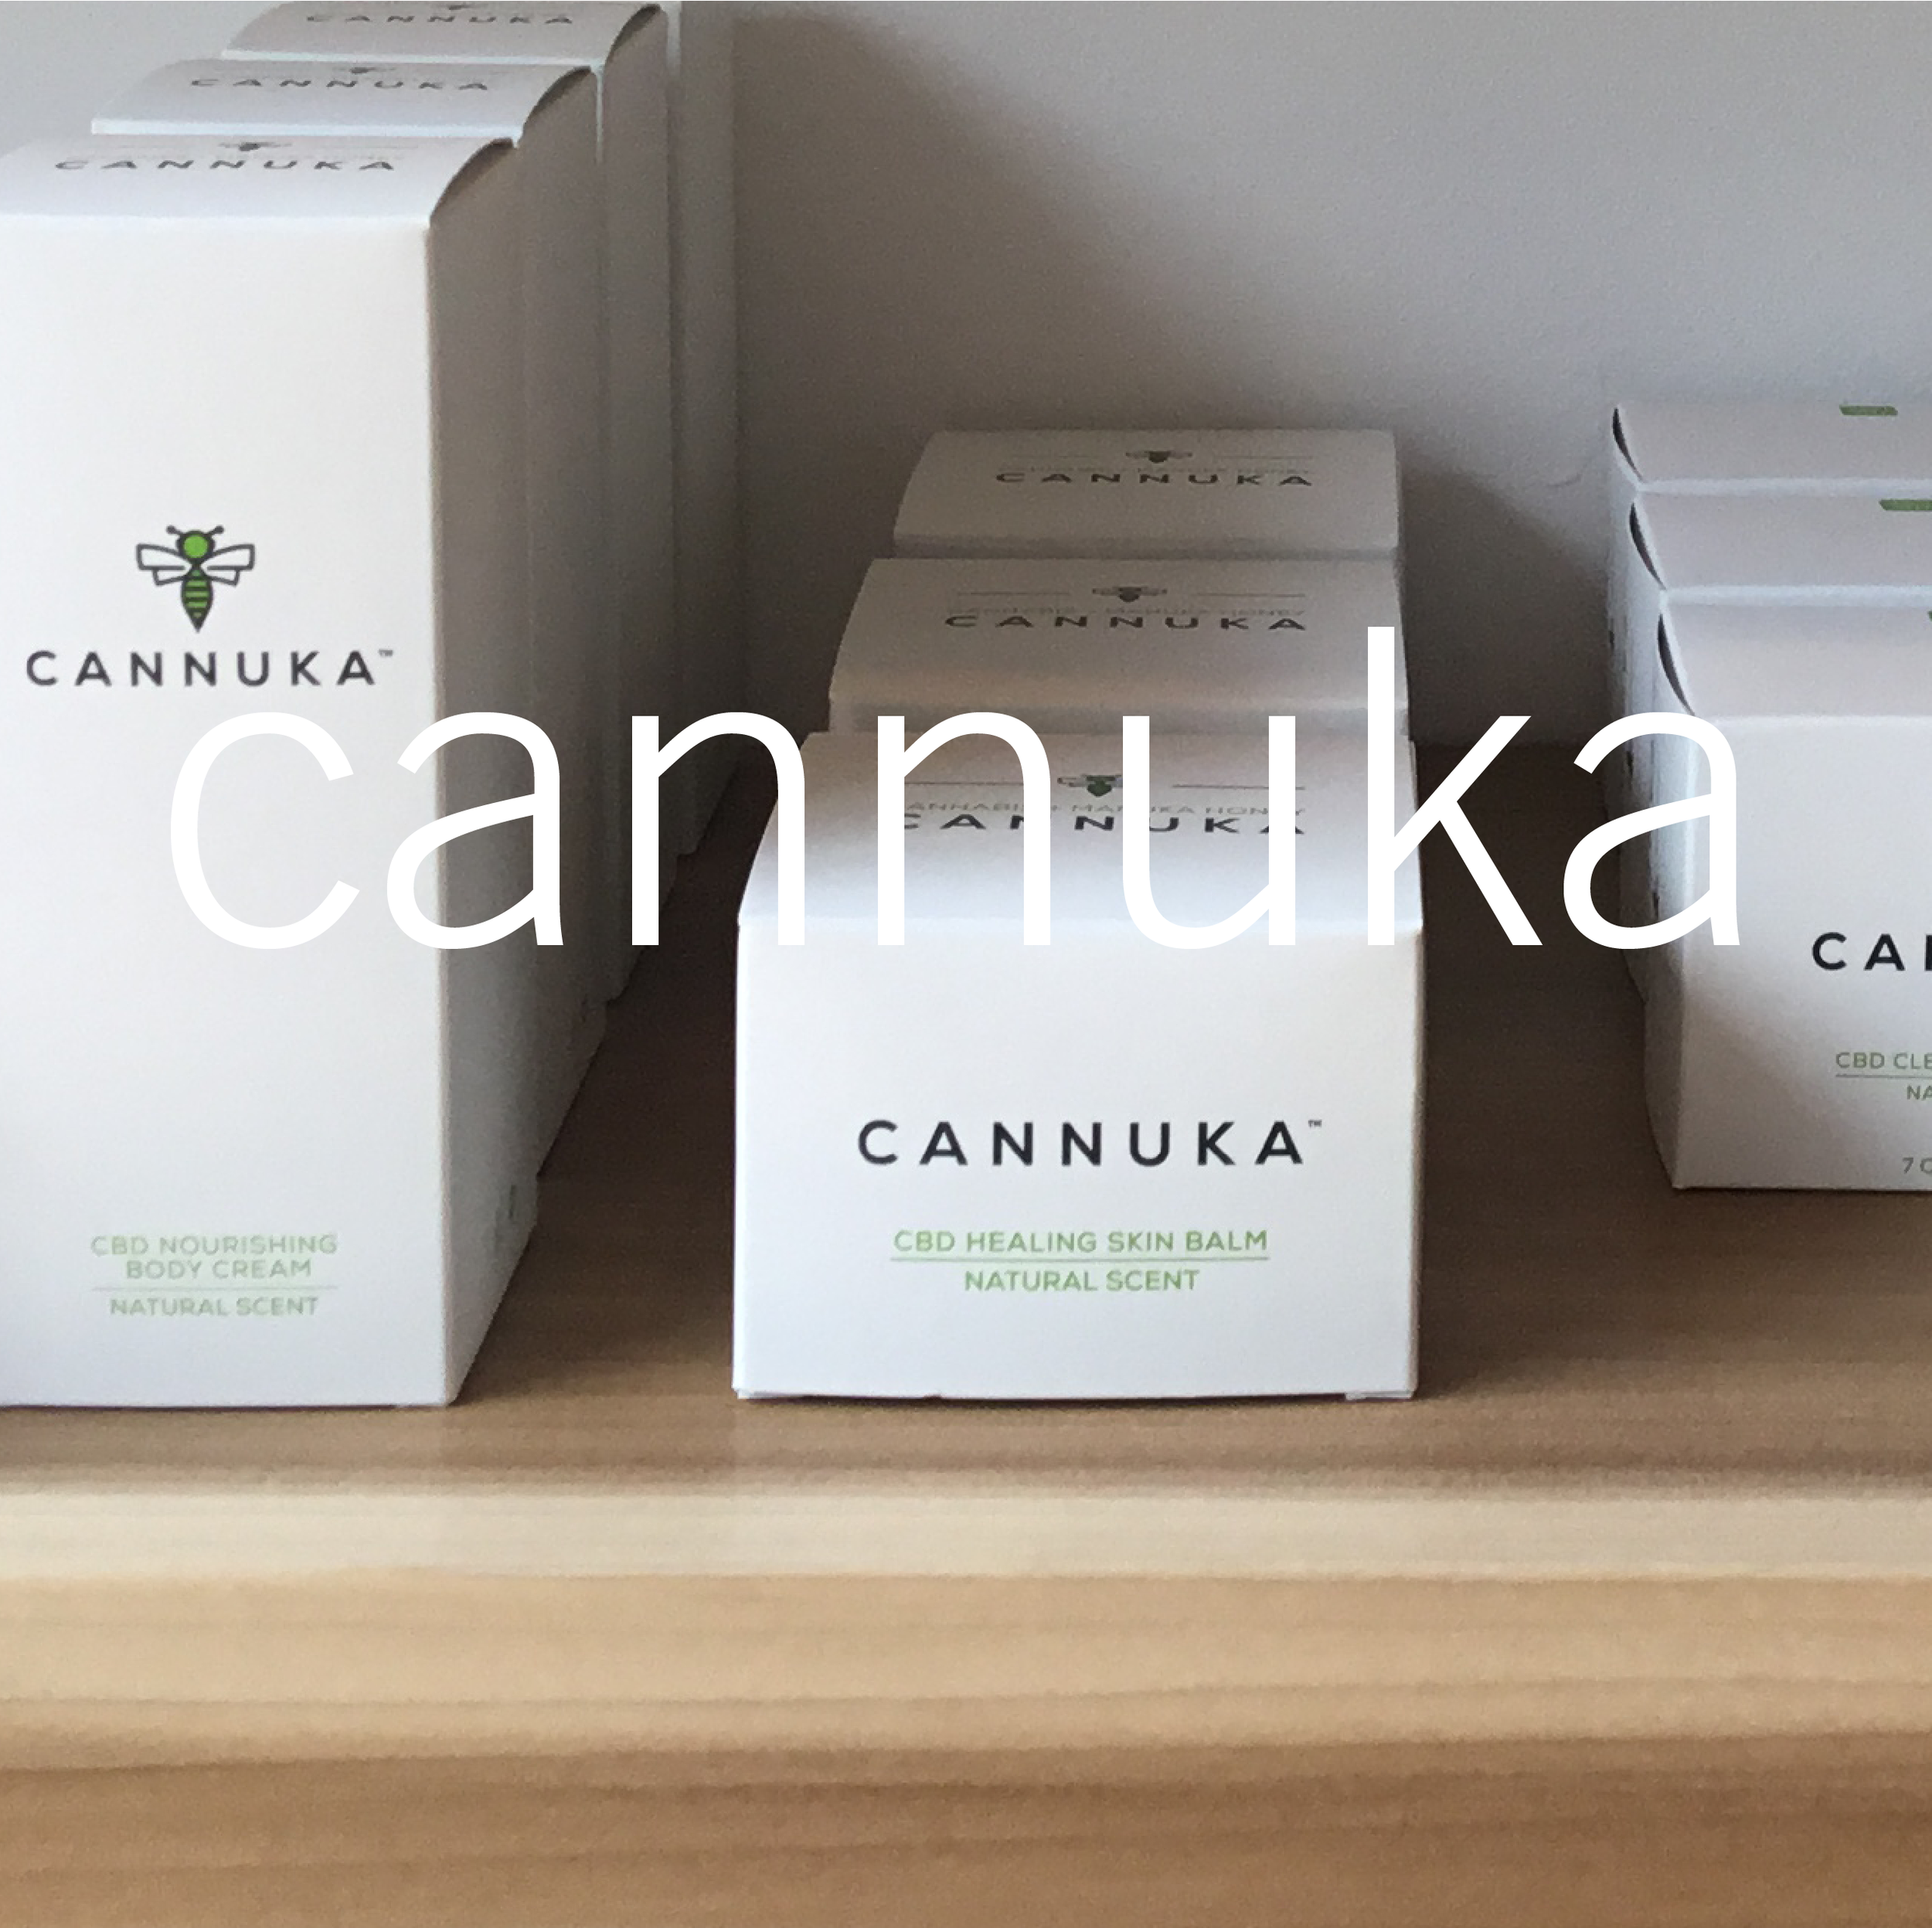 cannuka cbd botanica evanston